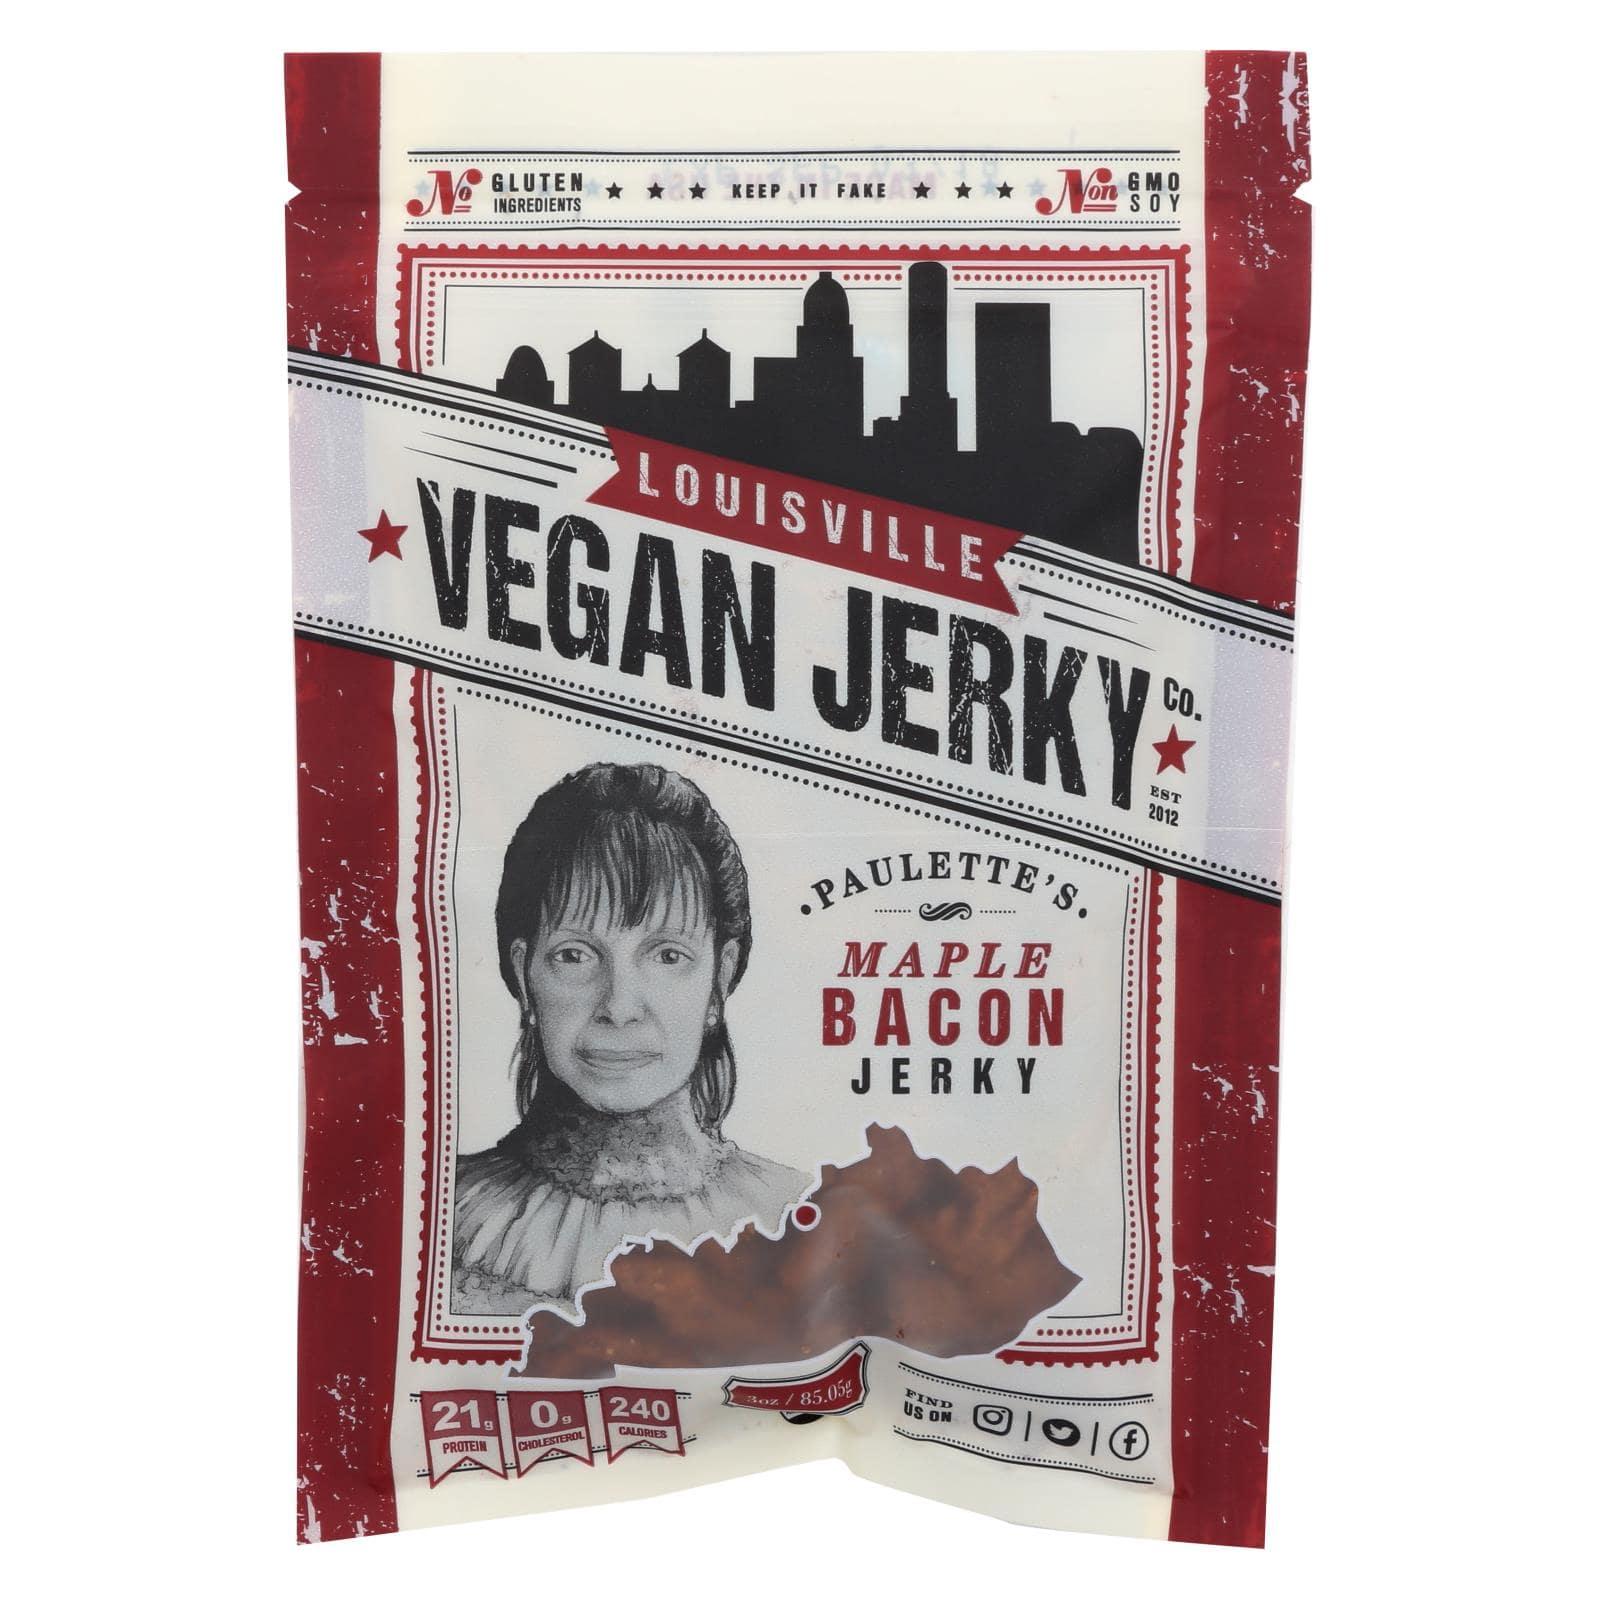 Louisville Vegan Jerky - Maple Bacon